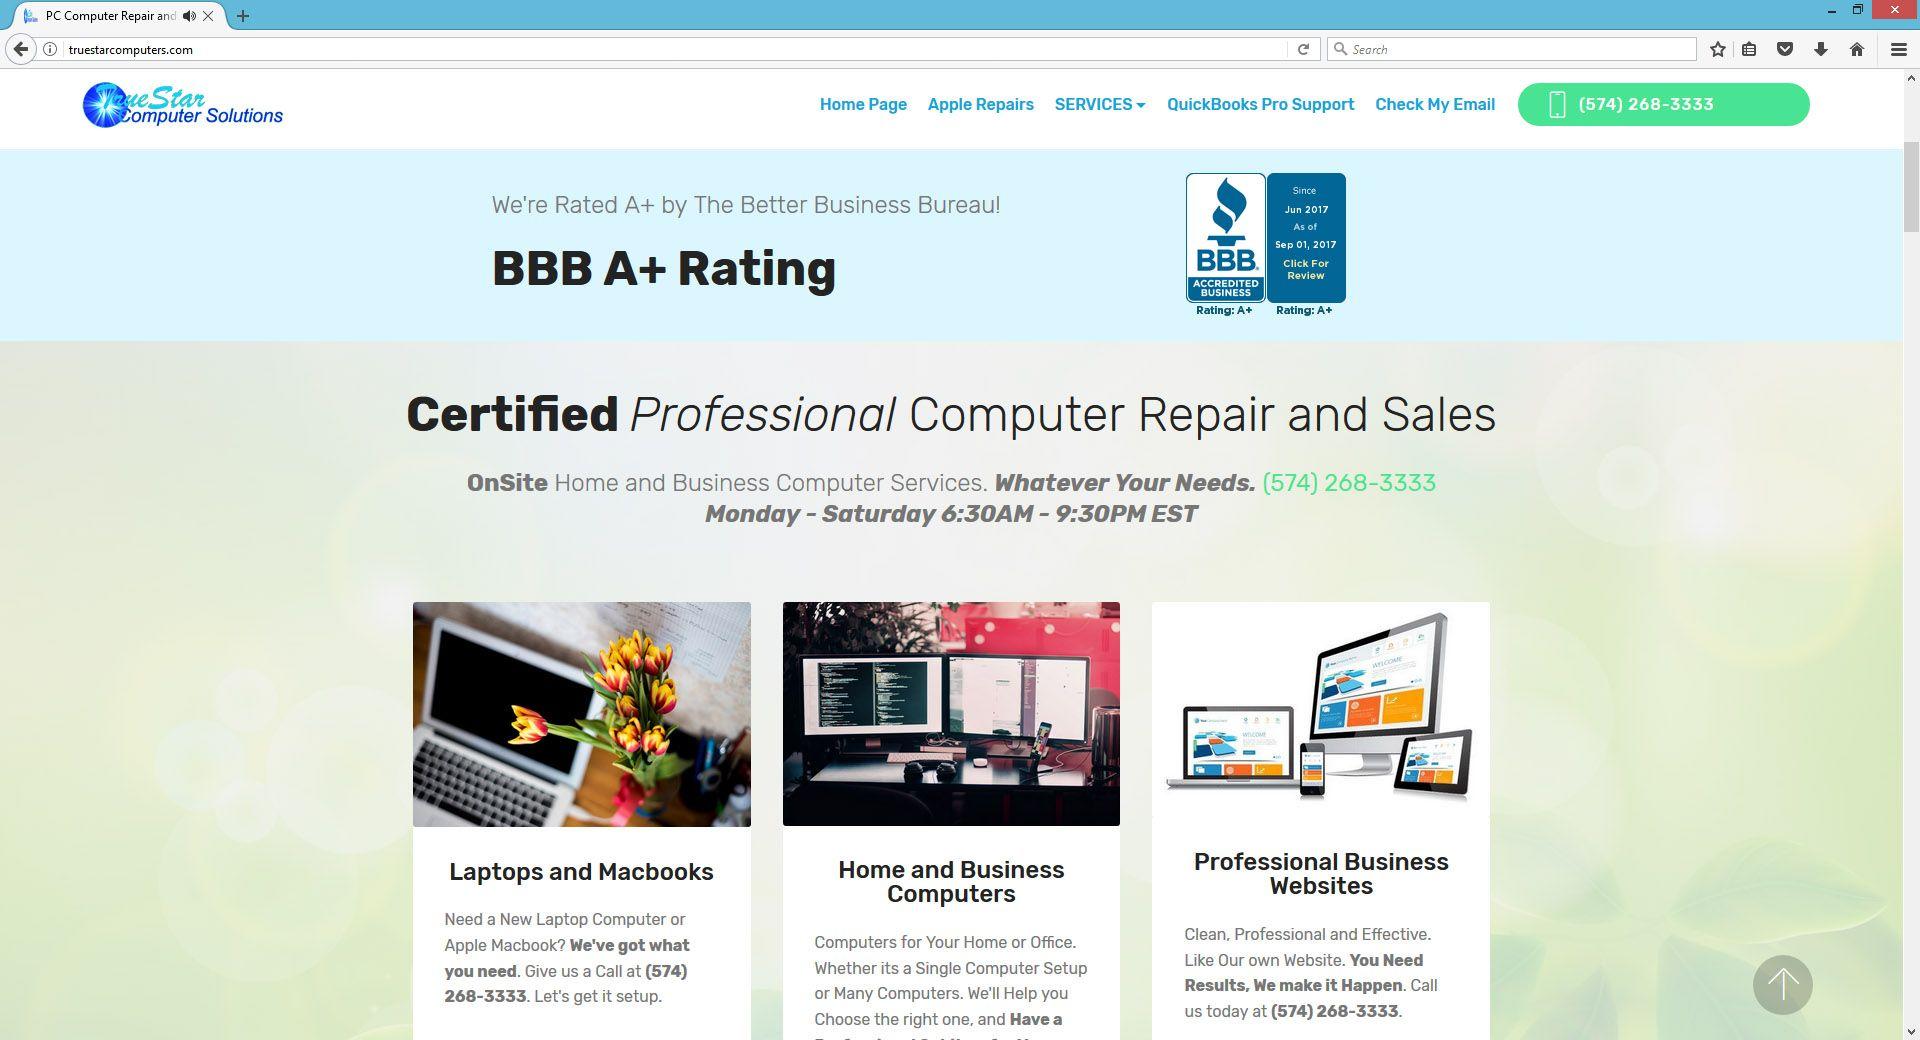 Website Design by Professionals Warsaw Indiana | True Star Computer ...